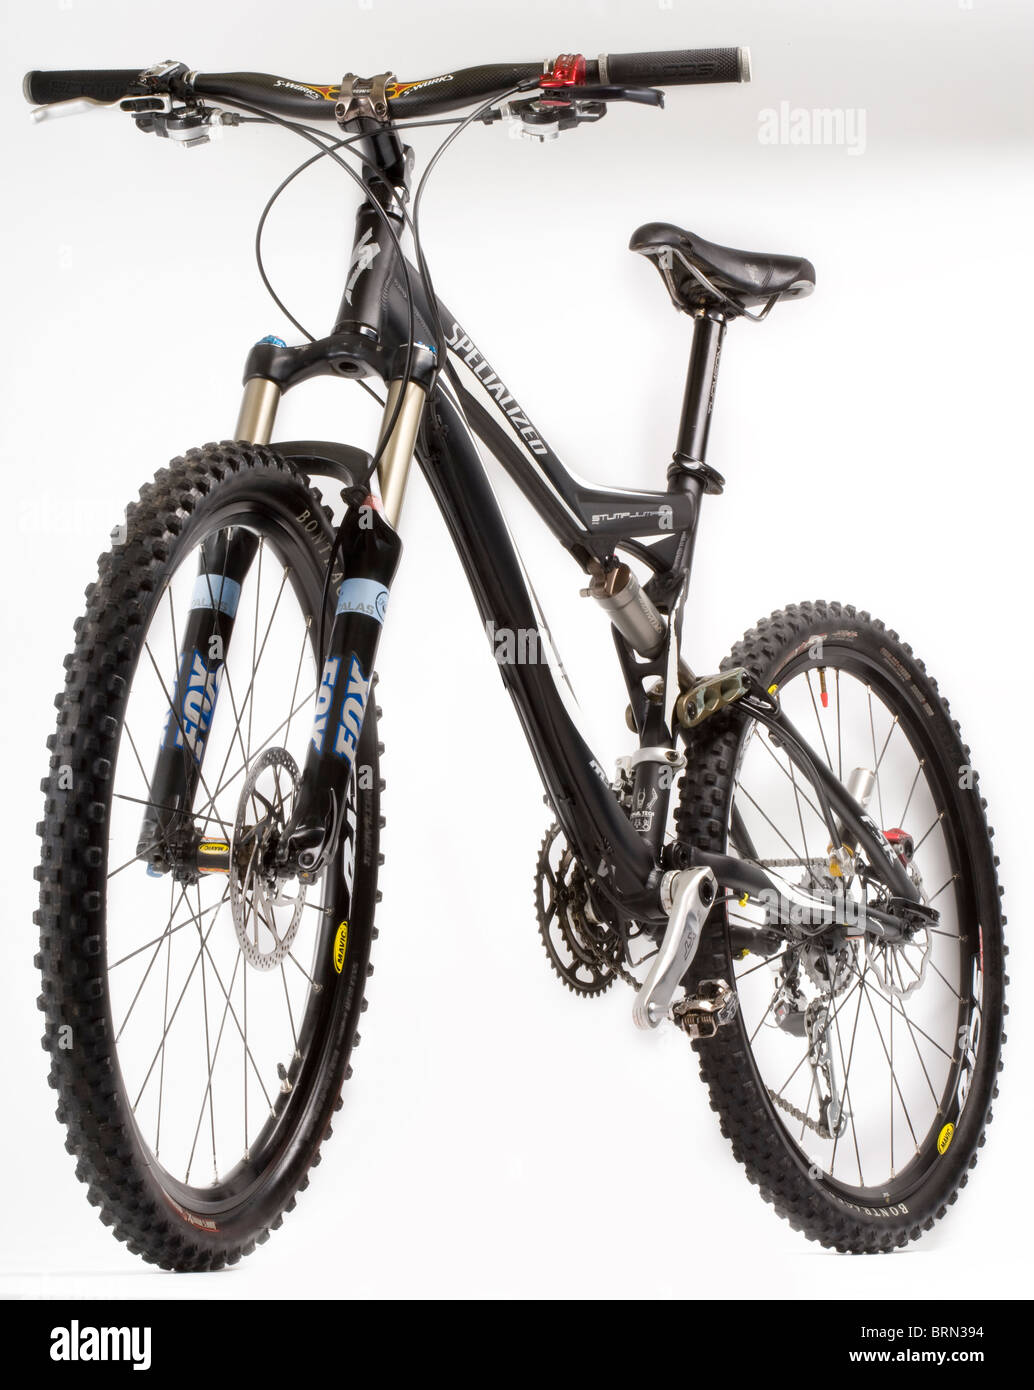 Dual suspension mountain bike - Stock Image